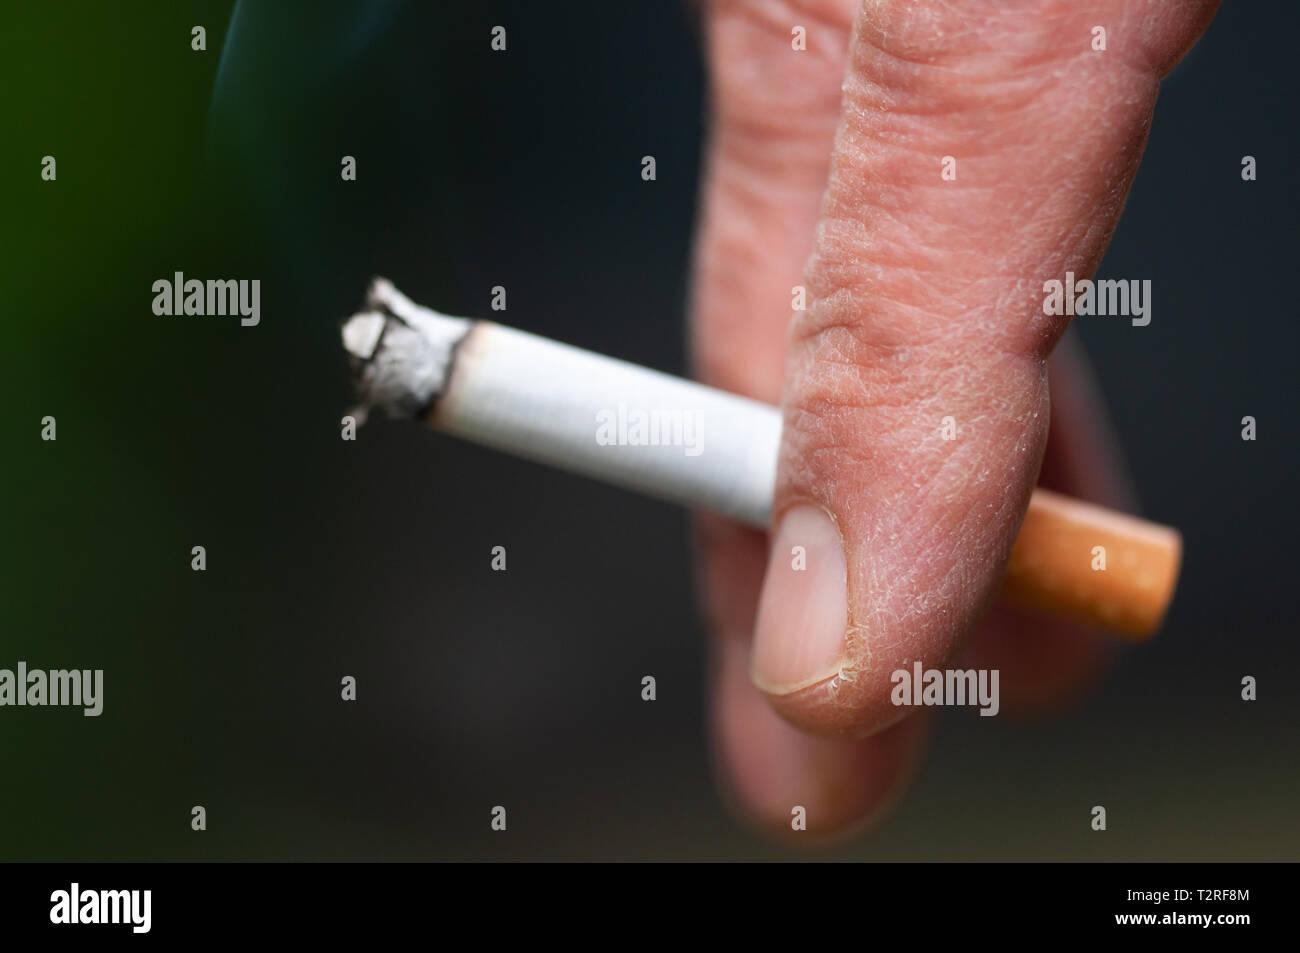 Smoking is a bad habit - Stock Image